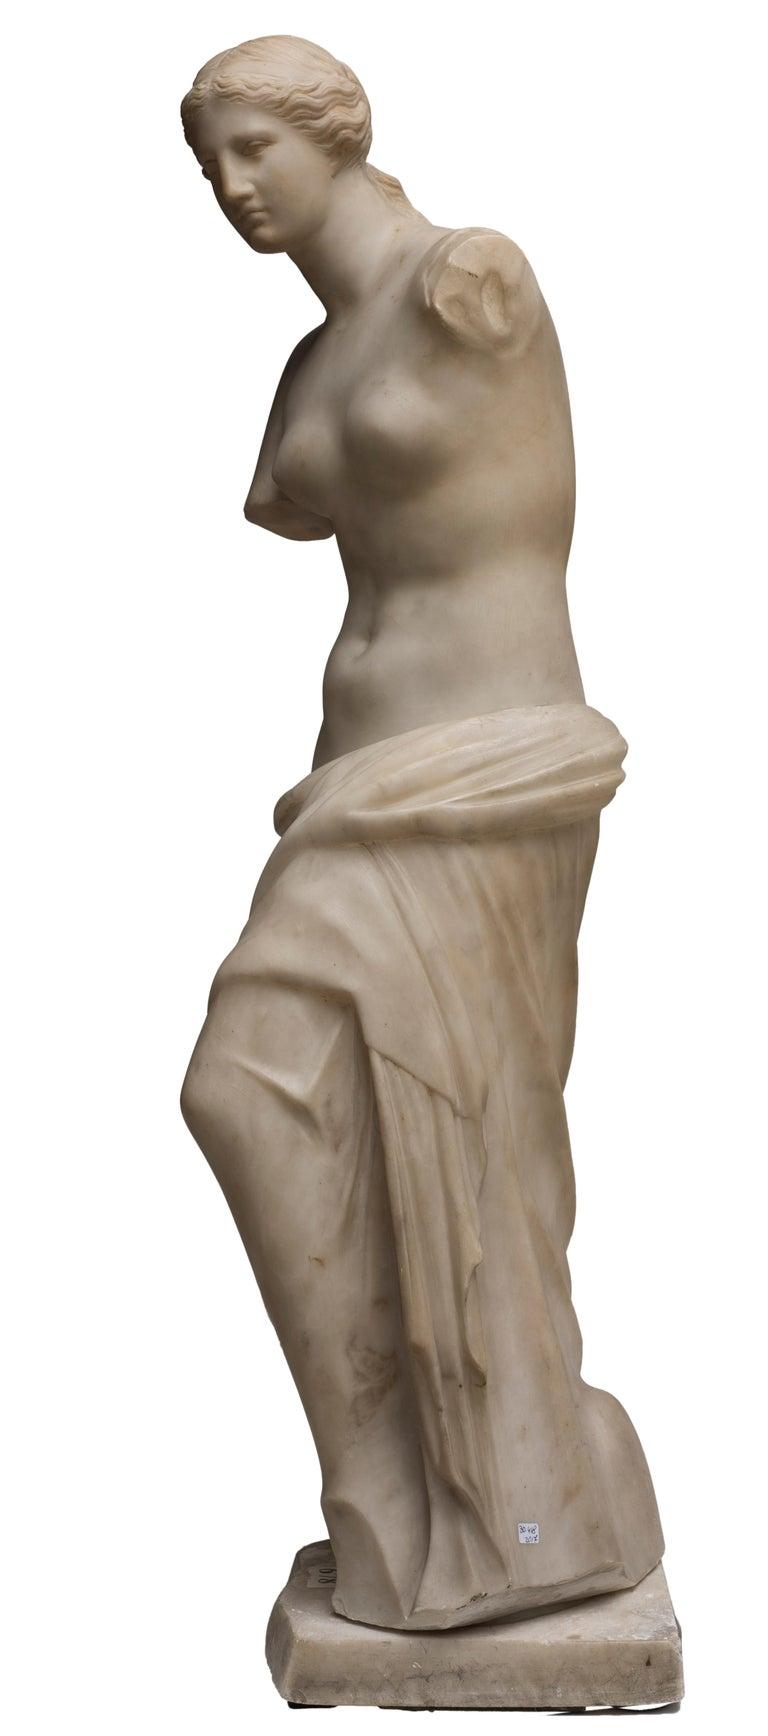 Early 19th Century Carrara Marble Sculpture Copy of Venus de Milo by French Sculptor, circa 1820 For Sale